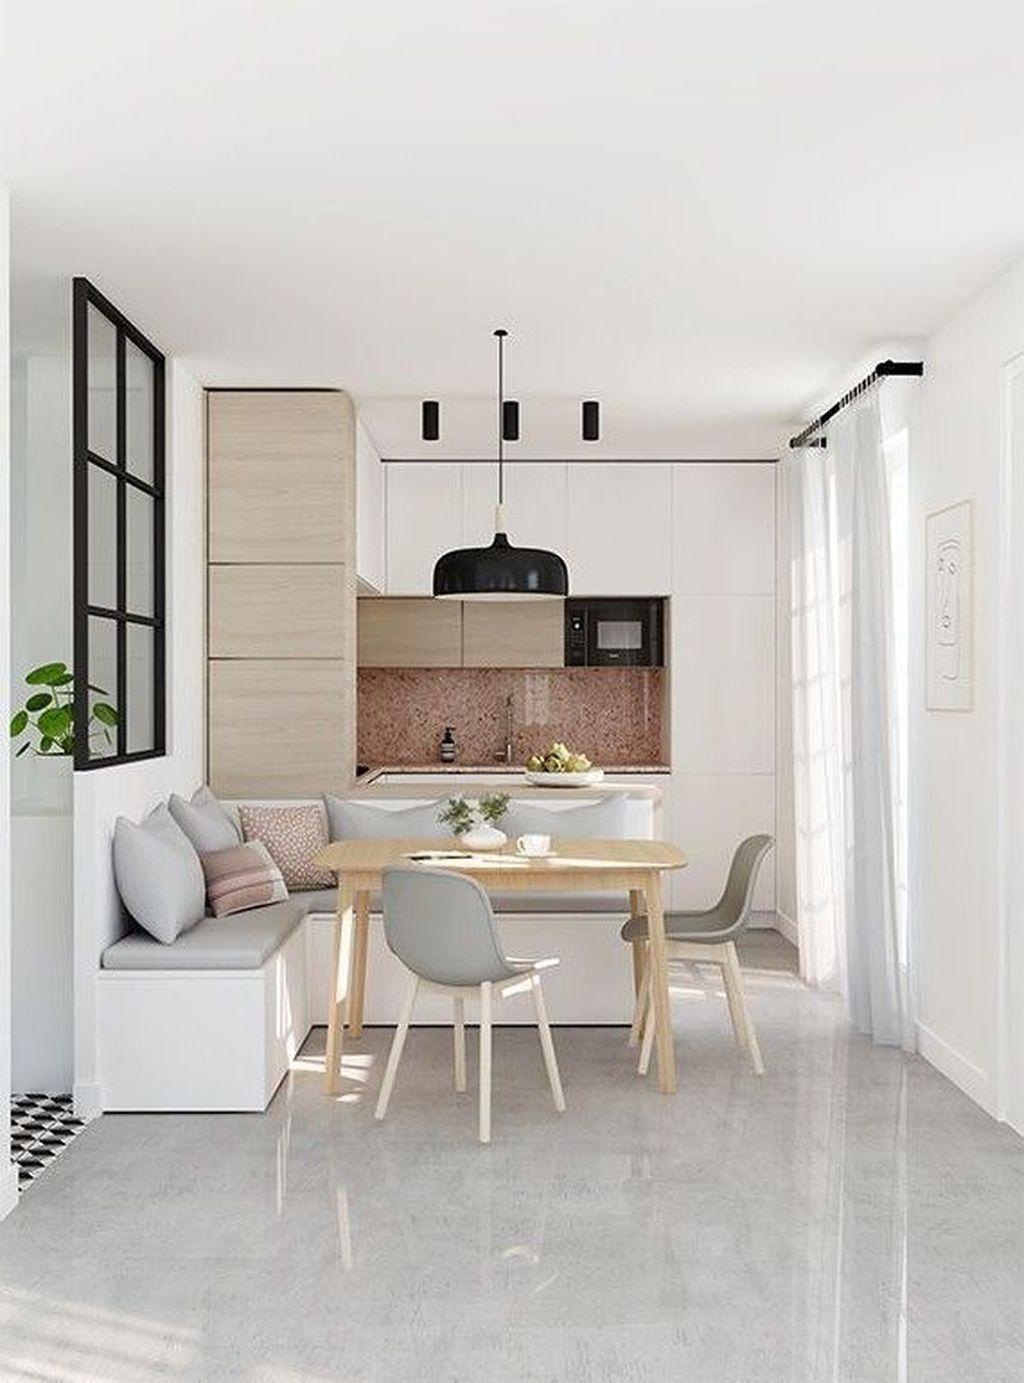 38 Beautiful Small Dining Room Design Ideas For Apartments Cuisines Design Banquette Salle A Manger Deco Maison Interieur